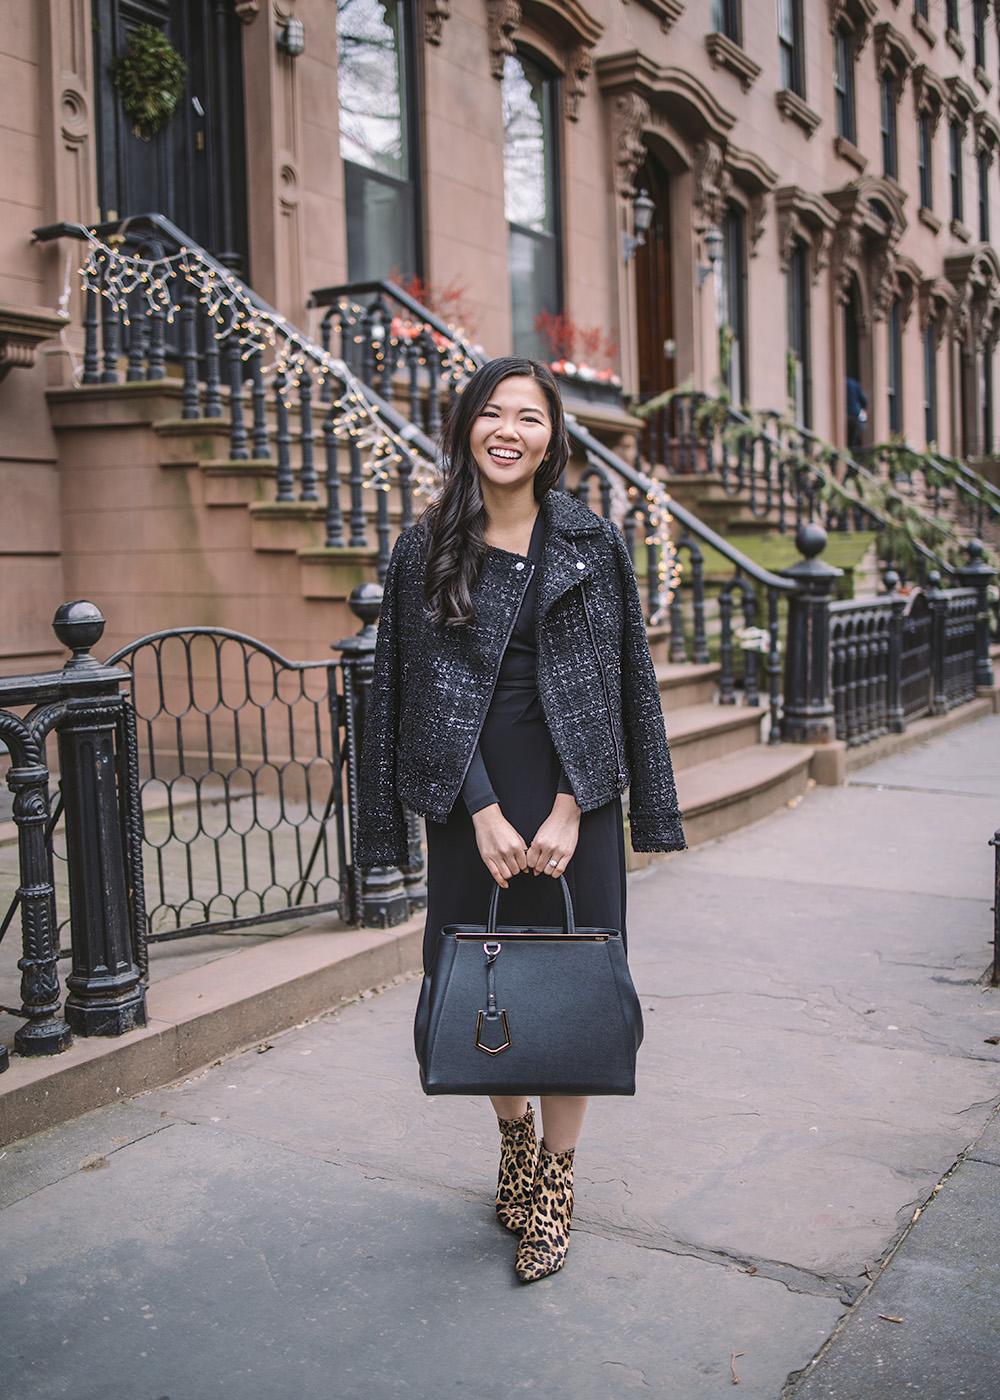 What to Wear to Work / Tweed Moto Jacket & Black Wrap Dress